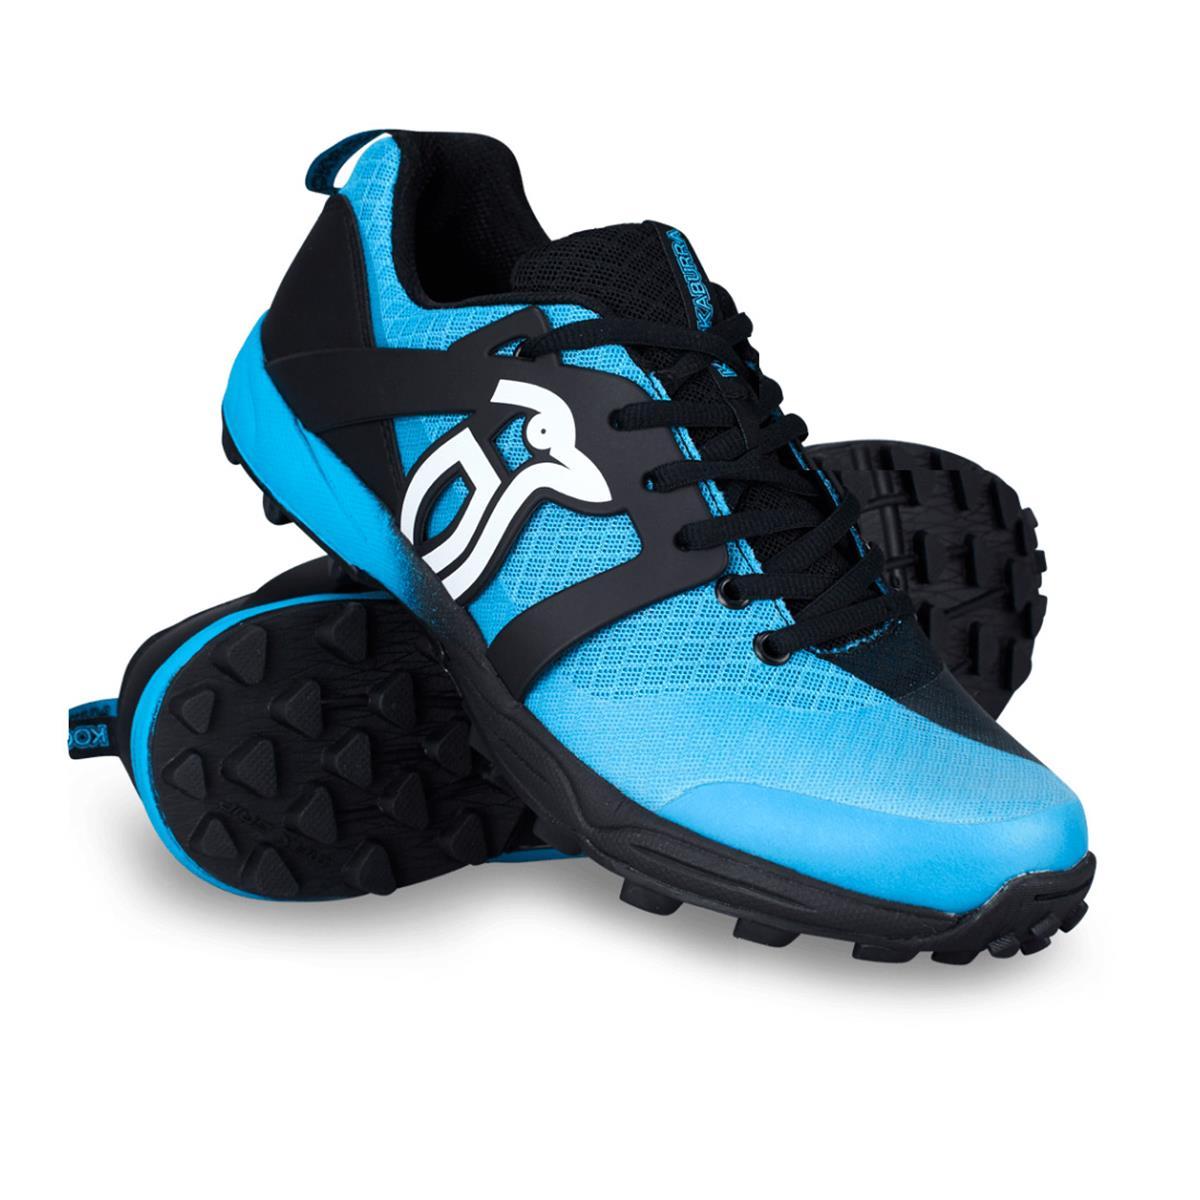 b202b8dcf1ca Kookaburra Xenon Hockey Shoes